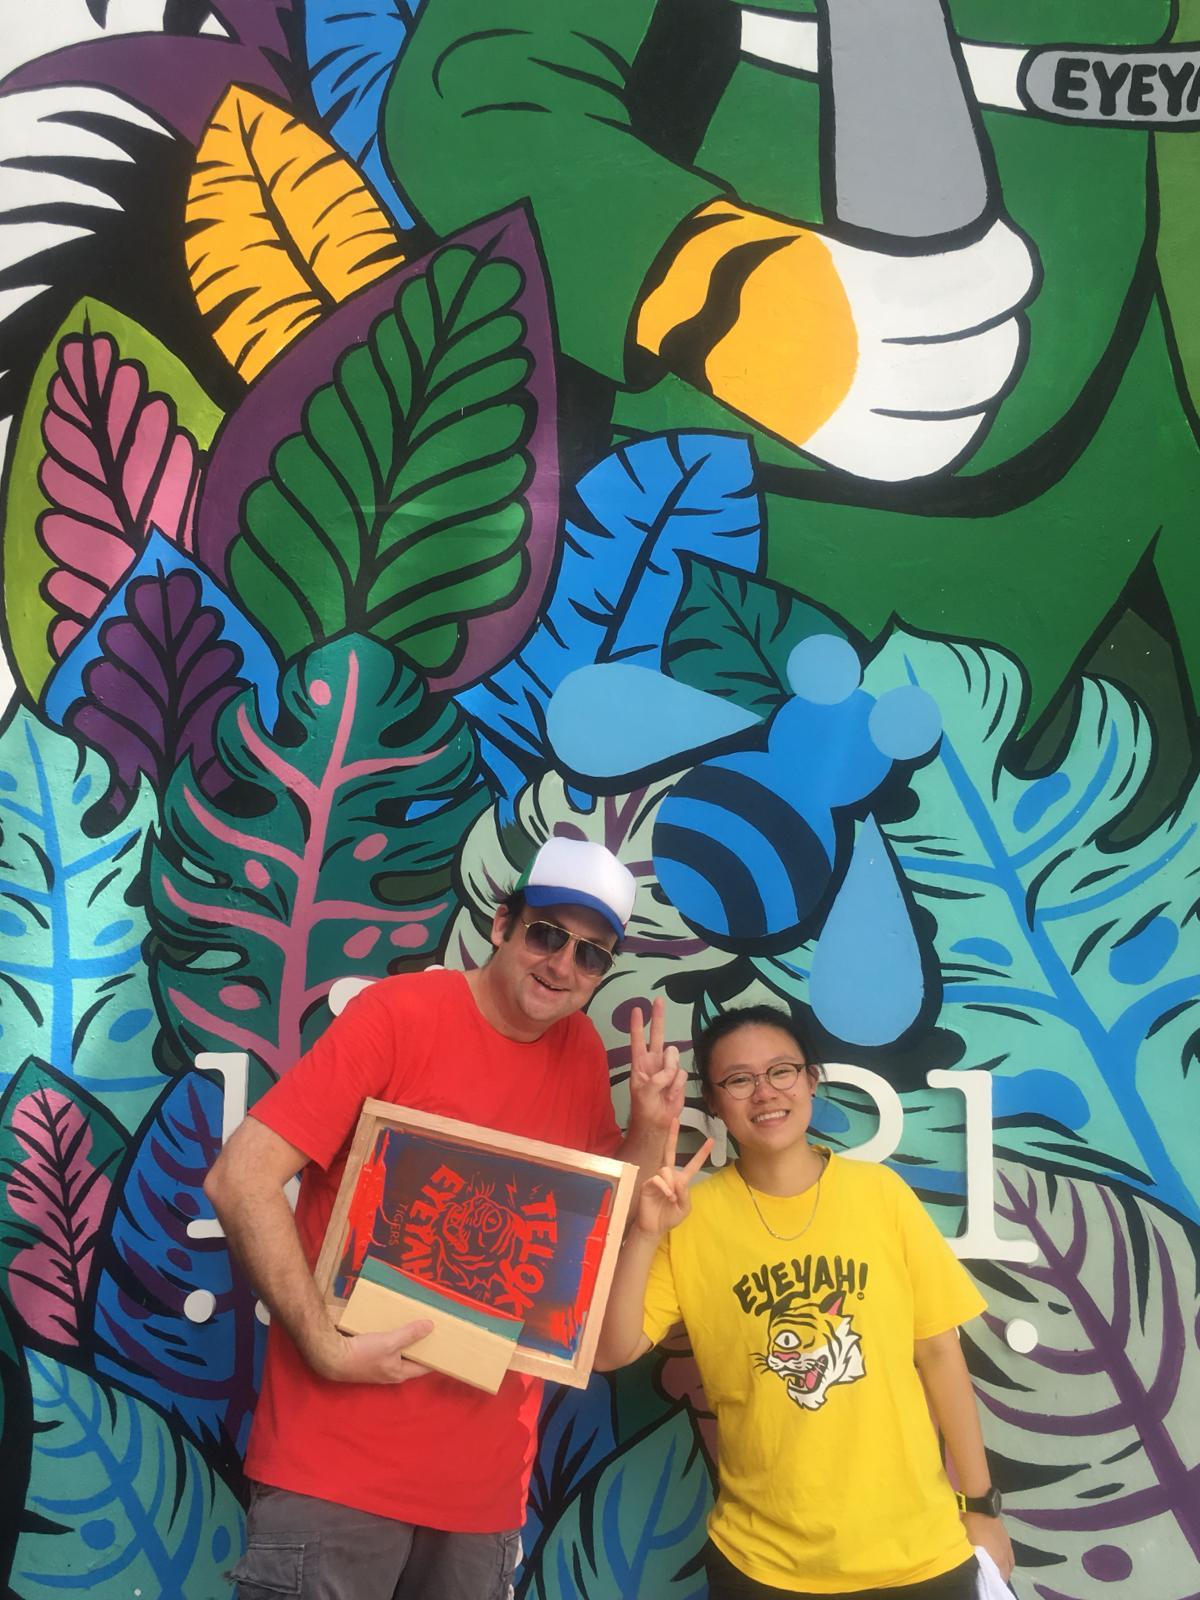 Co-founder Steve Lawler and creative Brenda Tan at the Kids21 x EYEYAH pop-up